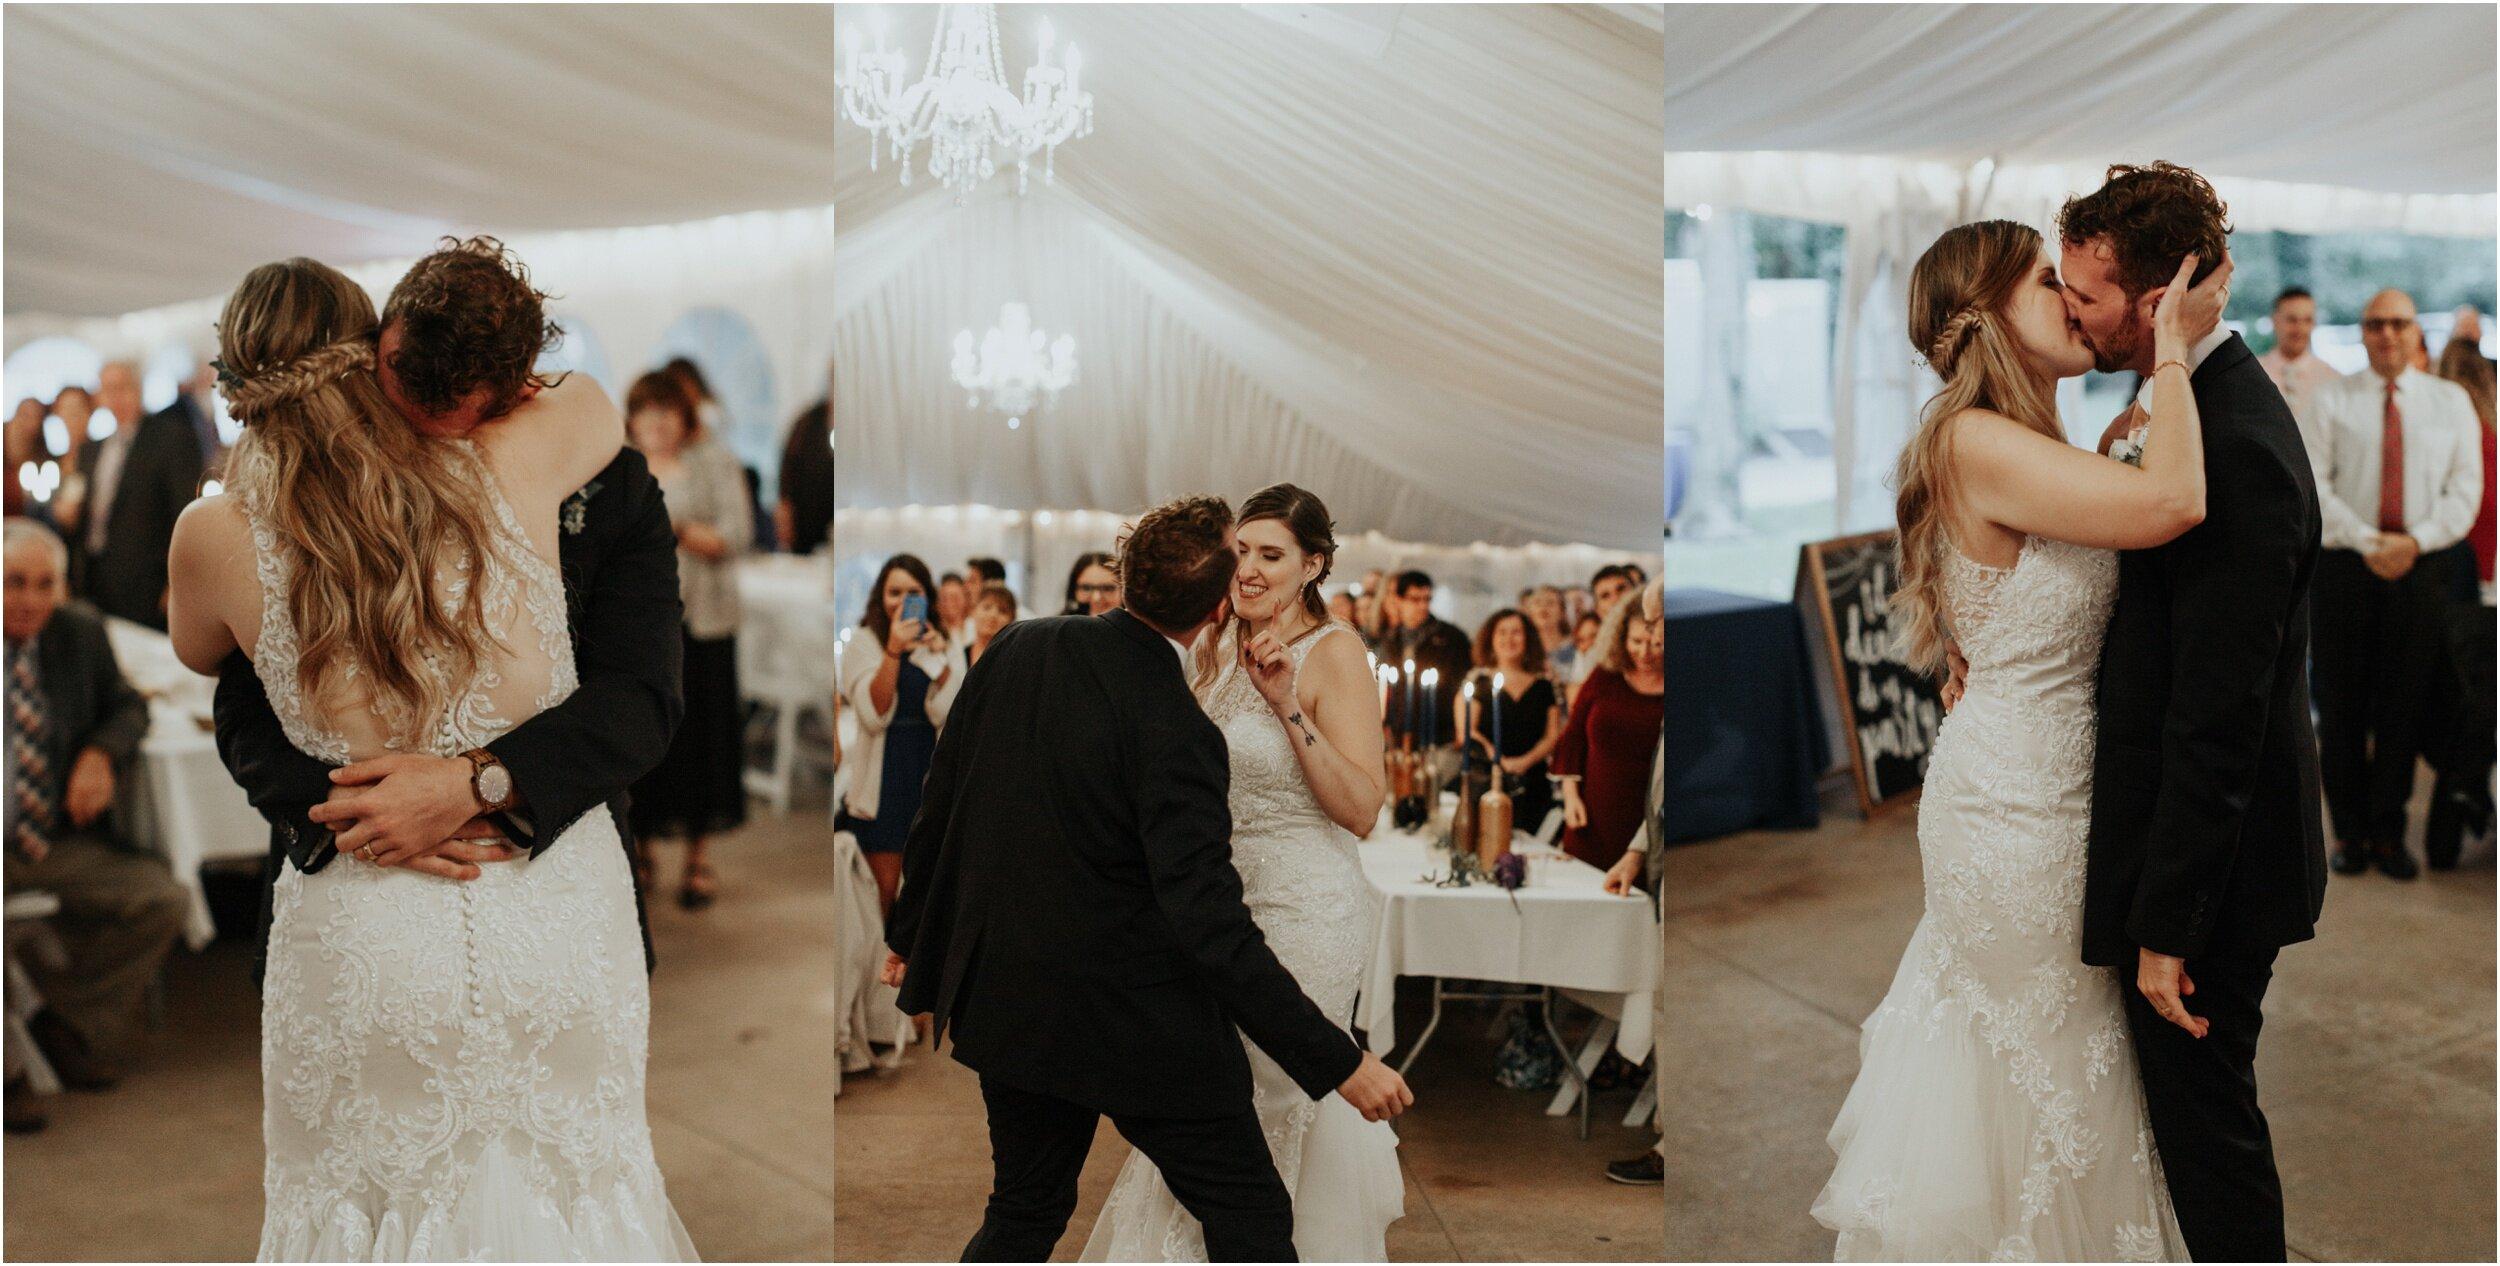 steph-and-jordan-cox-our-wedding-historic-shady-lane-compass-wedding-collective-hazel-lining-photography-destination-elopement-wedding-engagement-photography_0084.jpg